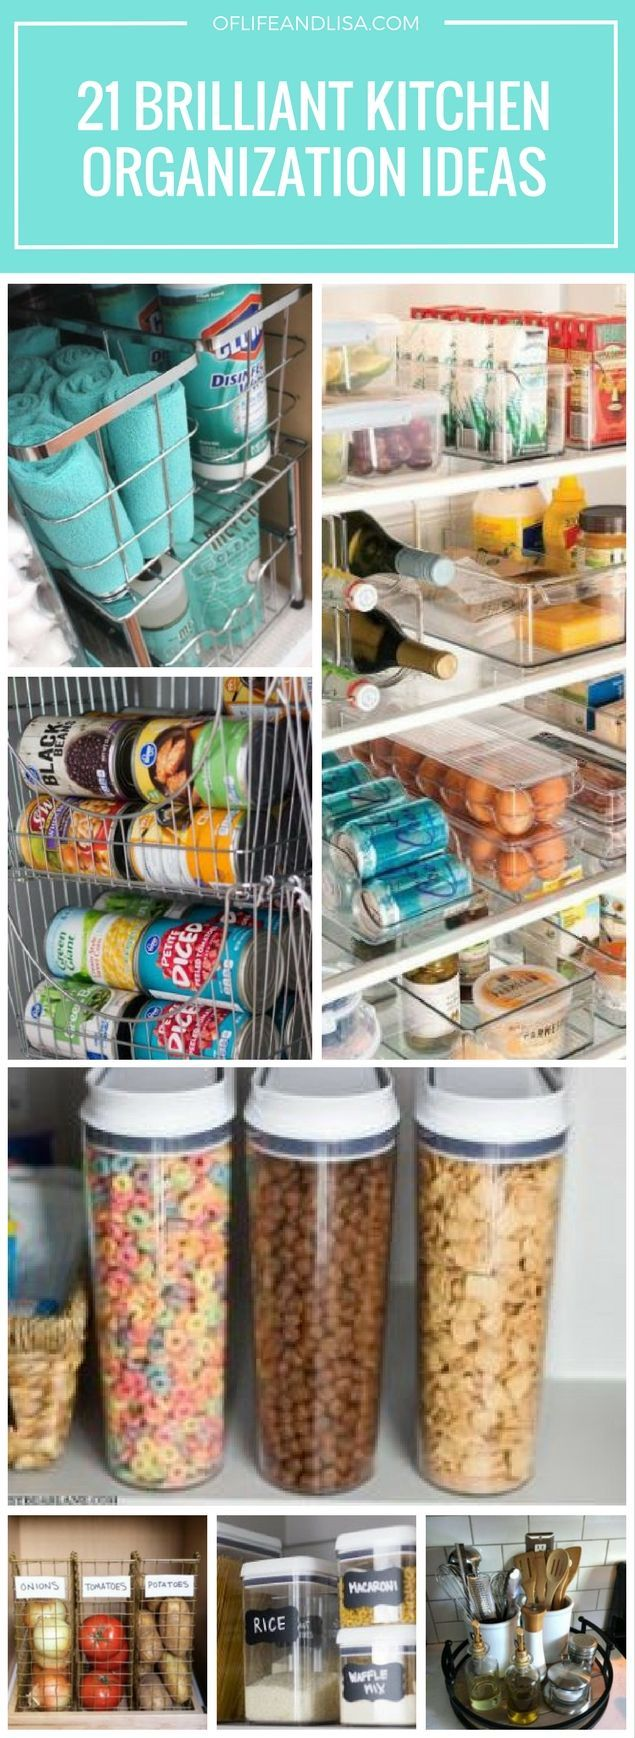 Brilliant DIY Kitchen Organization Ideas Organizing Kitchens - 21 brilliant tip jars guaranteed to make some money